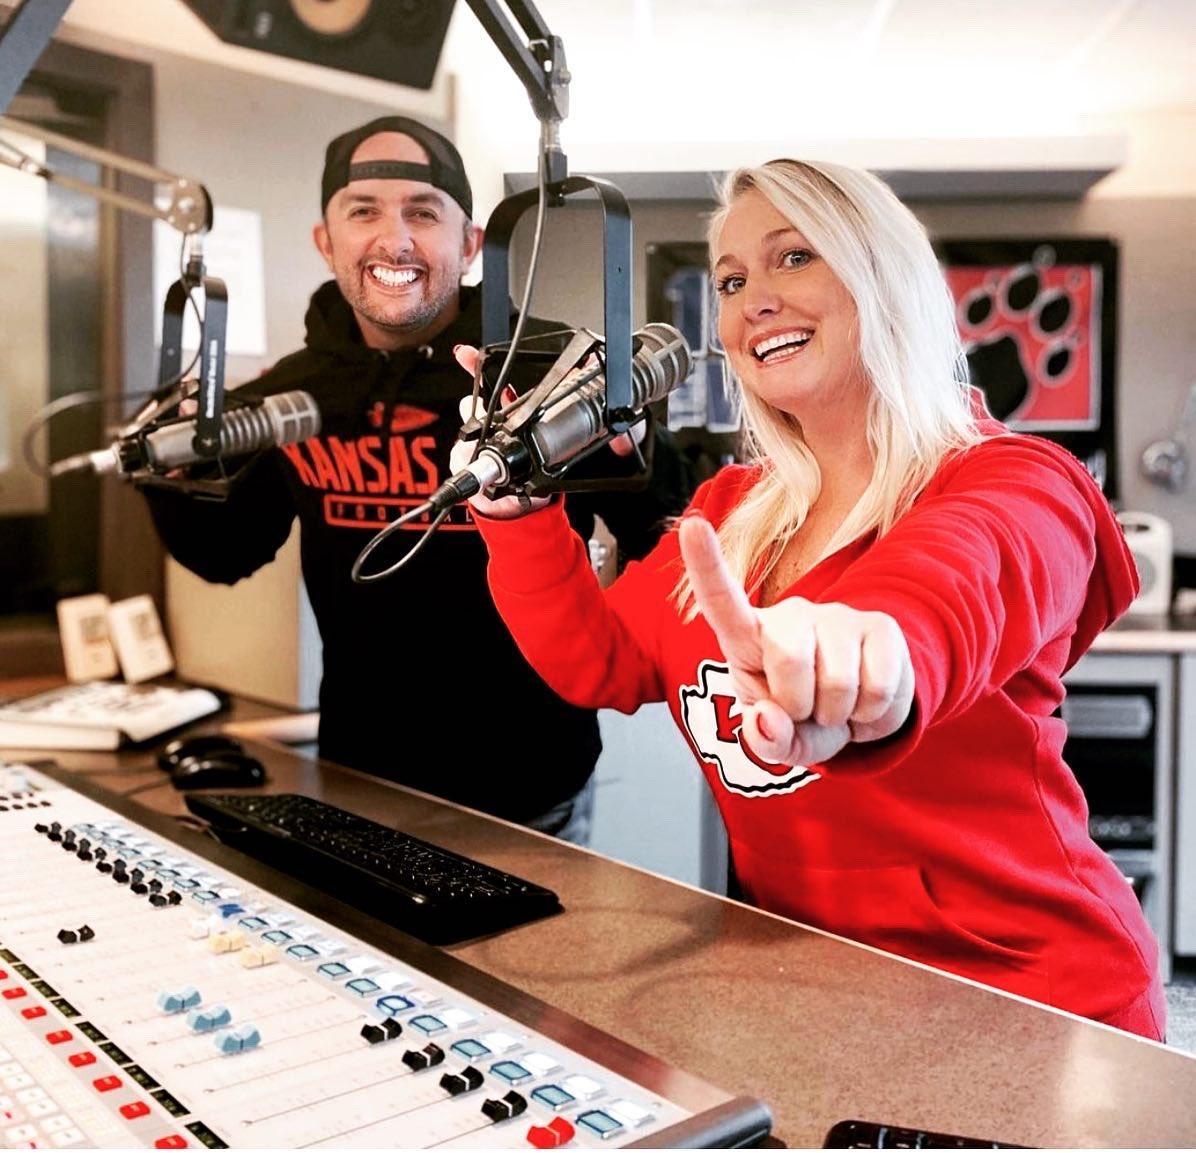 KANSAS CITY @Chiefs GAME DAY!! 😍🏈🔥 #Ready #RunItBack #ChiefsKingdom  Let's go #Chiefs #KansasCity 🚩  @radiogirlcodie @JJradioKC @ItsHappyAli @shotgunjaxon #CowBoyMike  We Are Proud To Be The Radio Home Of The Kansas City Chiefs 🐺🏈❤️